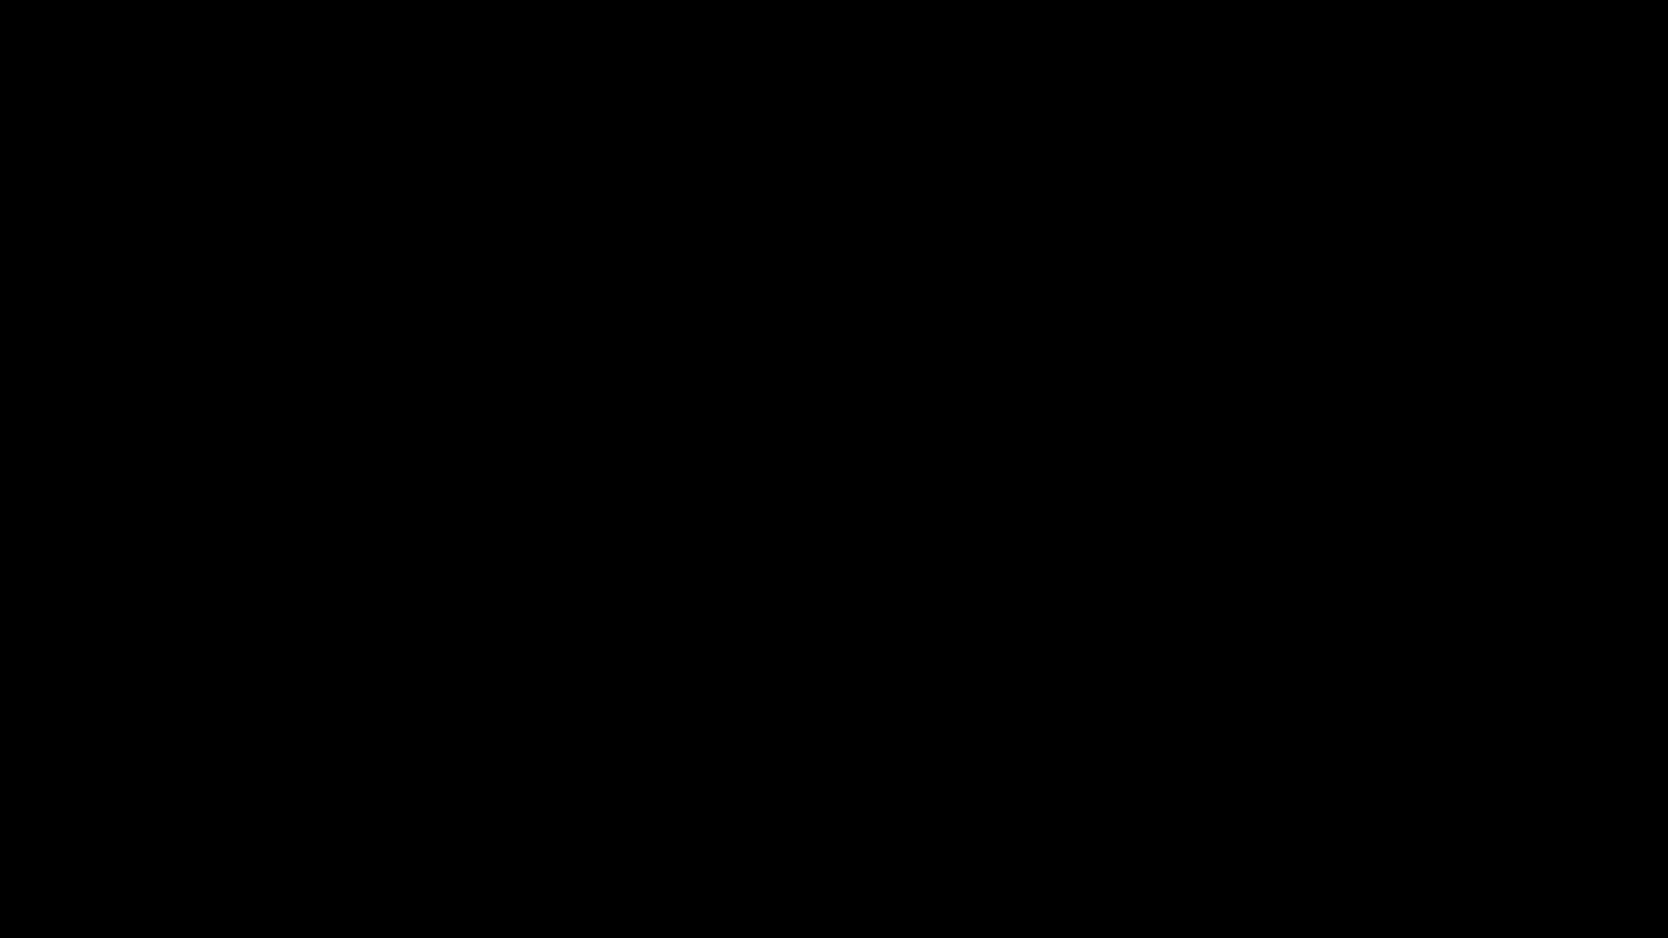 Company Logos Black-02.png